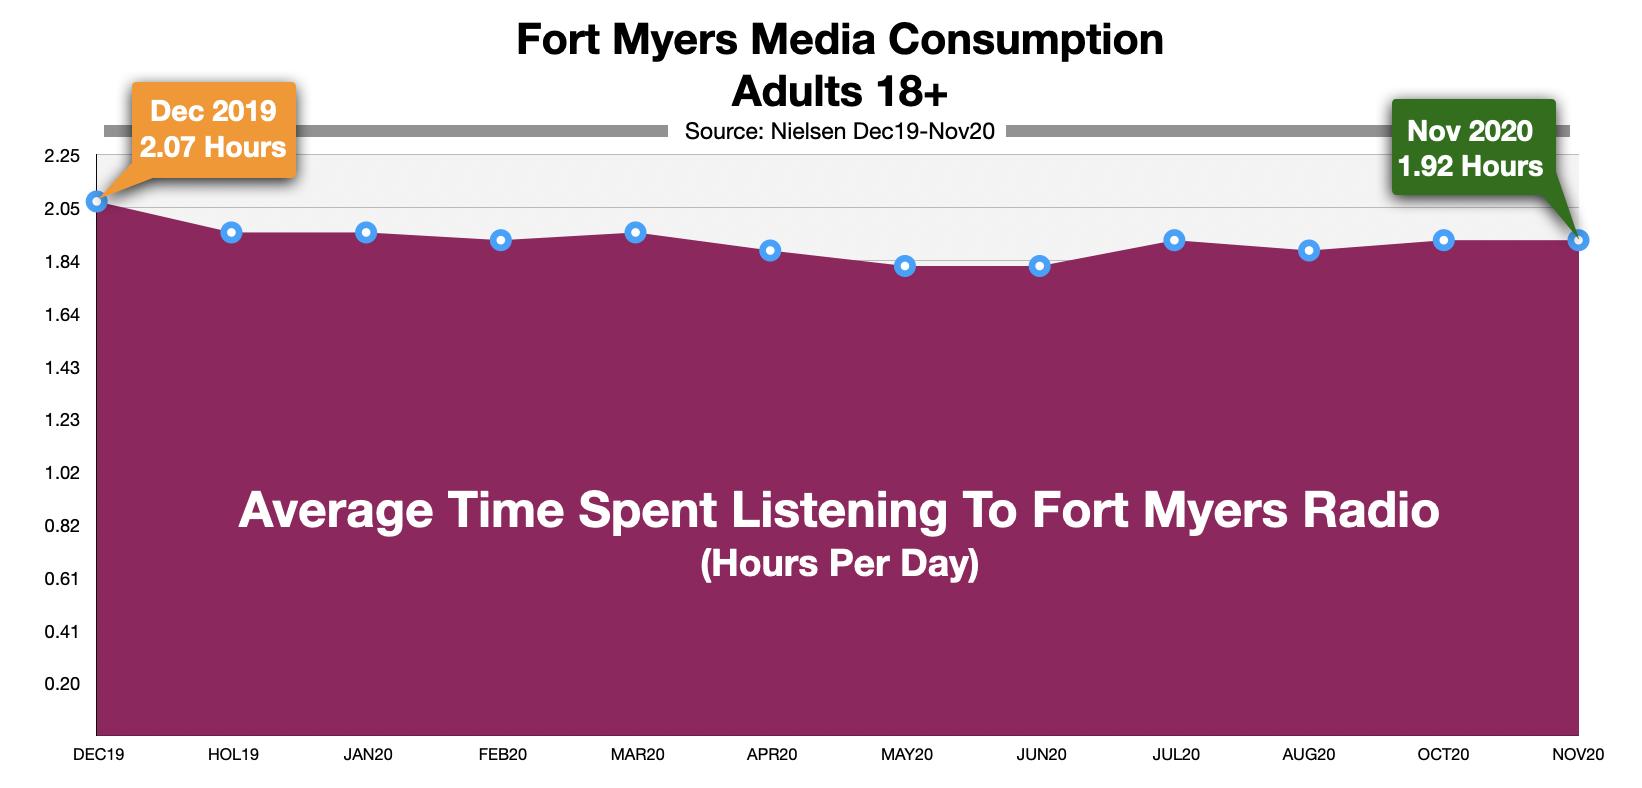 Advertising On Fort Myers Radio Time Spent Listening (NOV20)